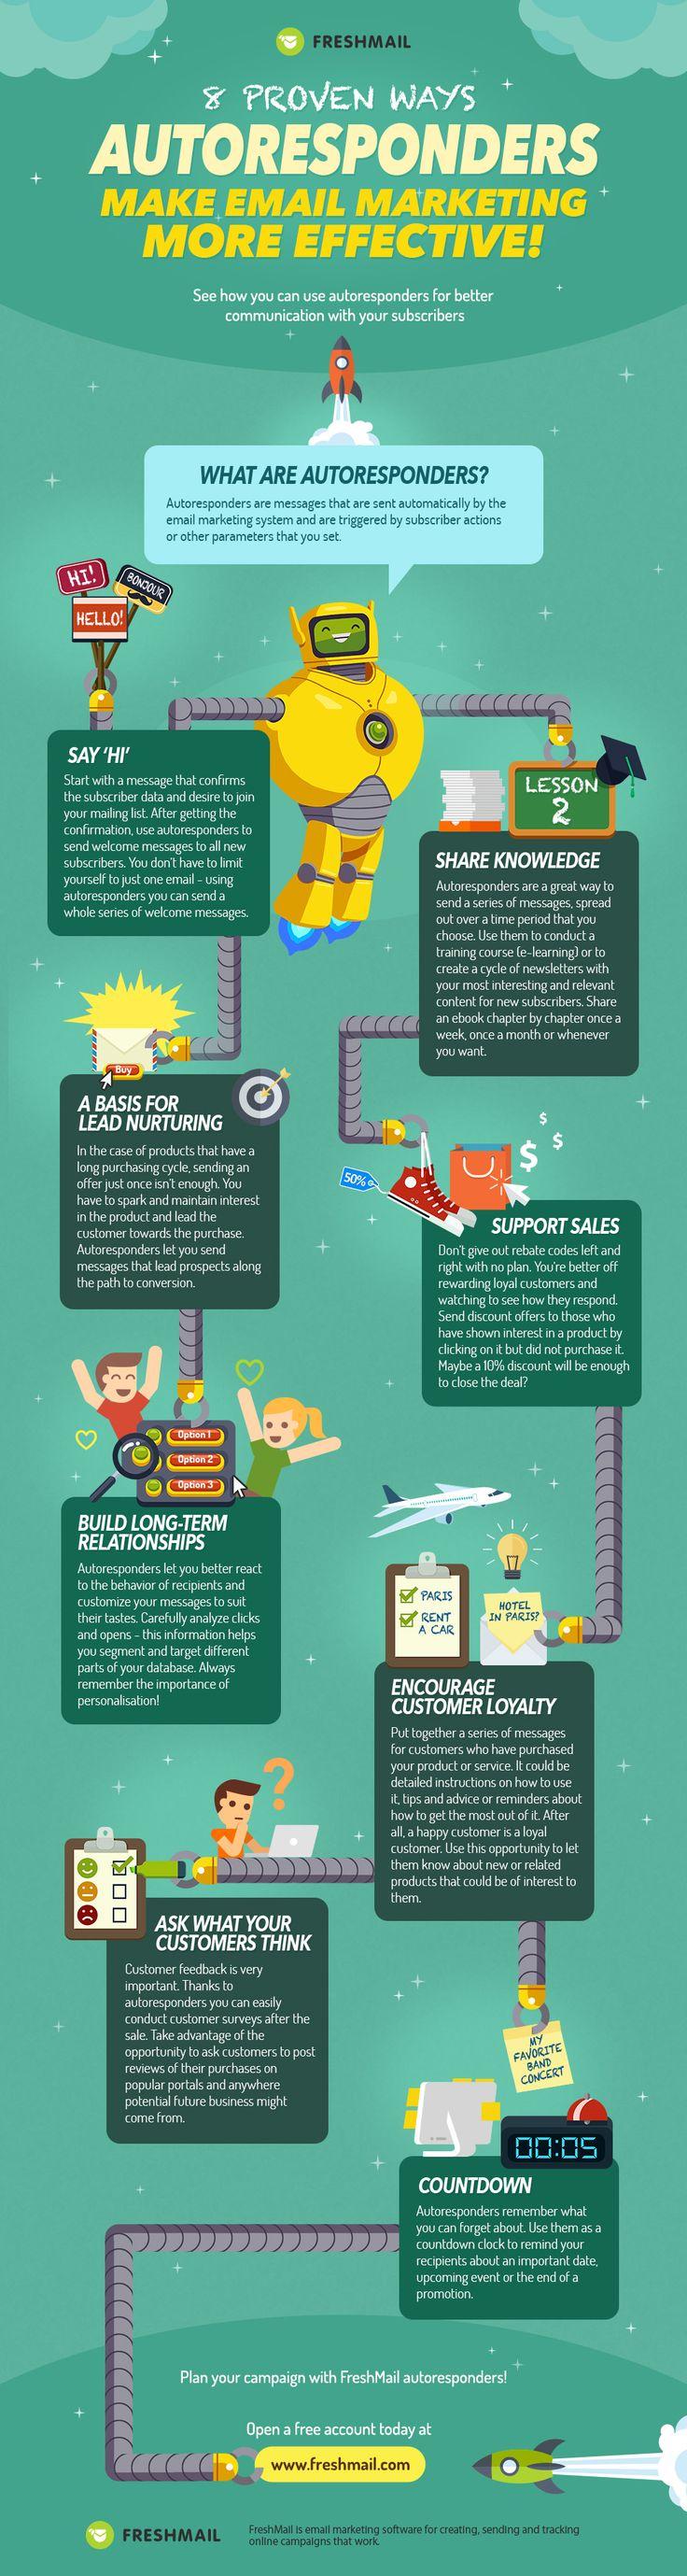 Get to know how #autoresponders work and recognize their value to #emailmarketing. #Infographic via FreshMail.com/?utm_content=buffer7fca4&utm_medium=social&utm_source=pinterest.com&utm_campaign=buffer